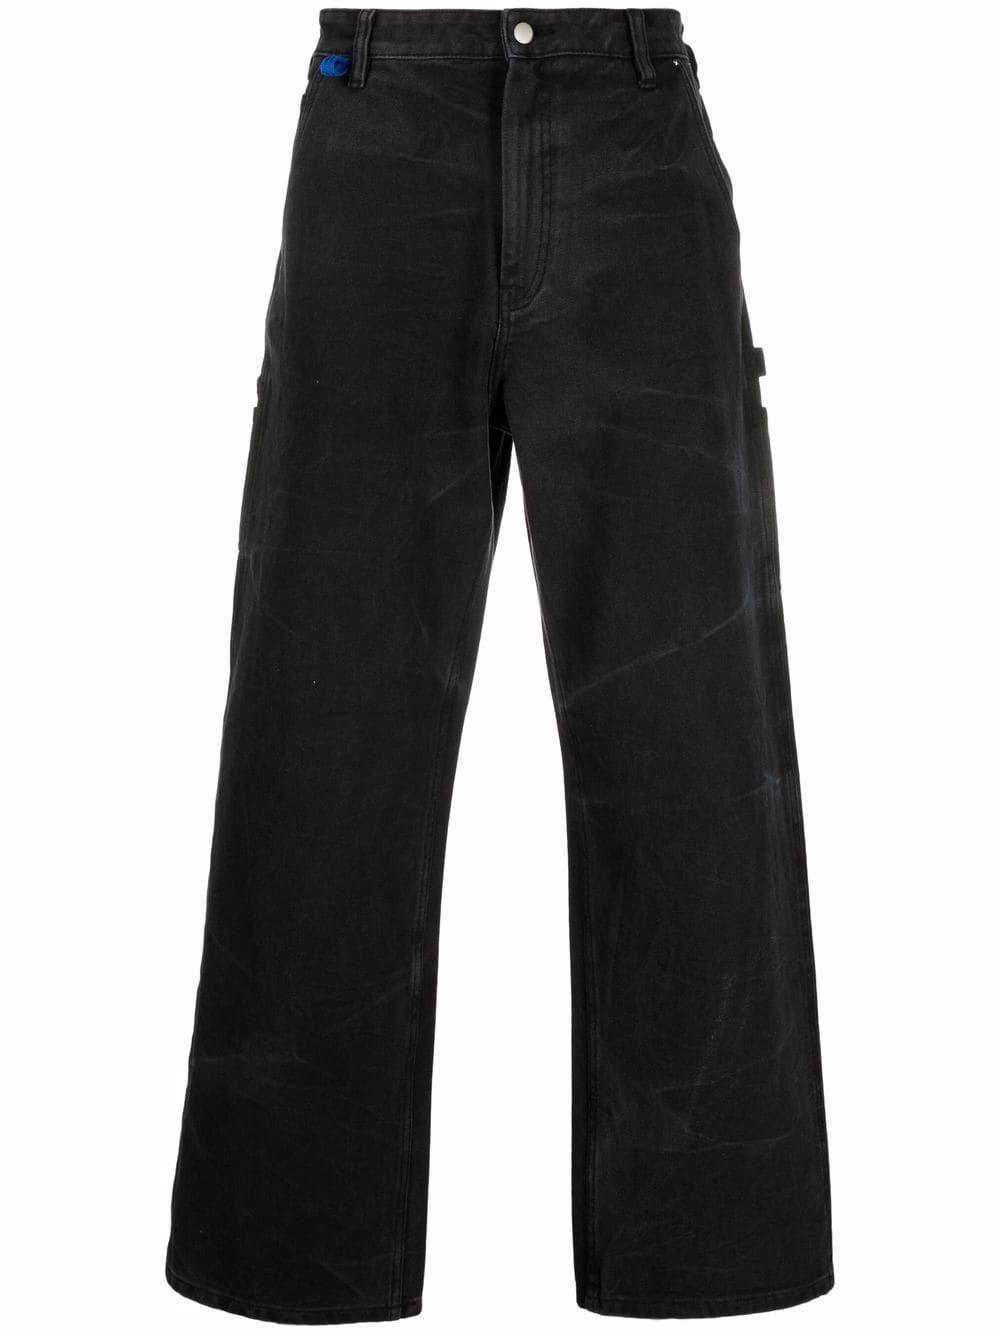 Acne pantaloni nero